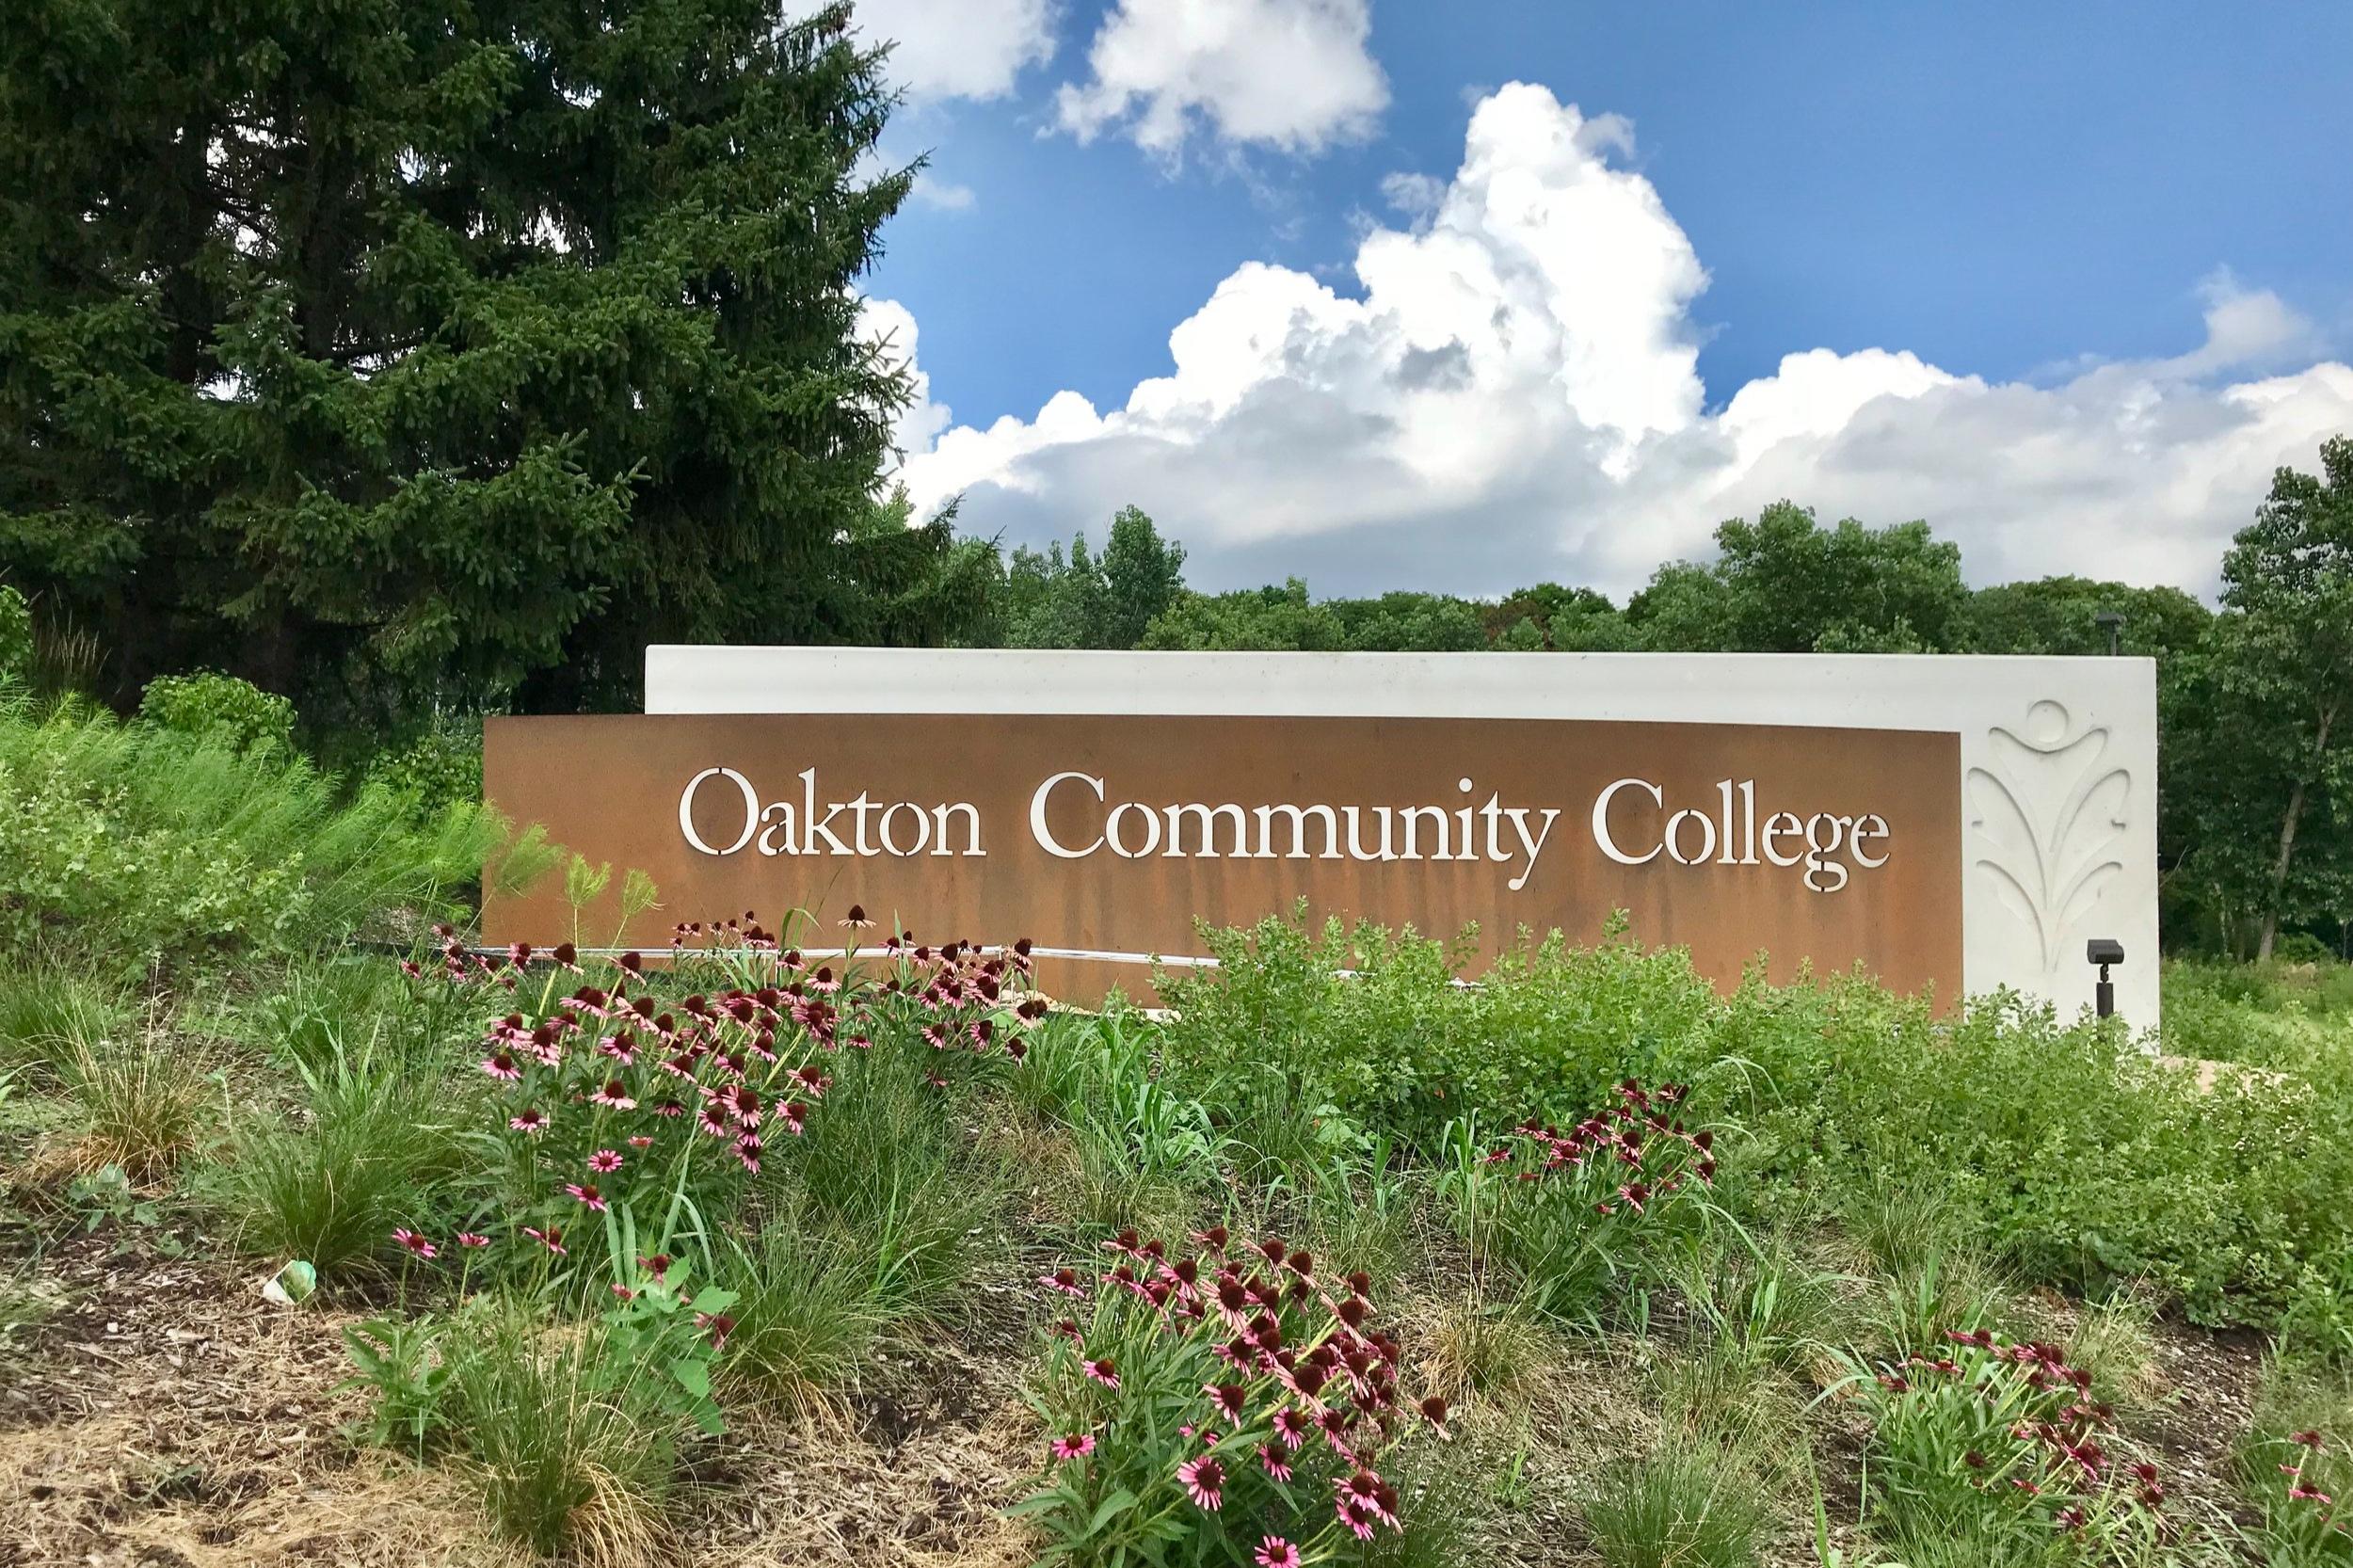 Oakton Community College Signage -